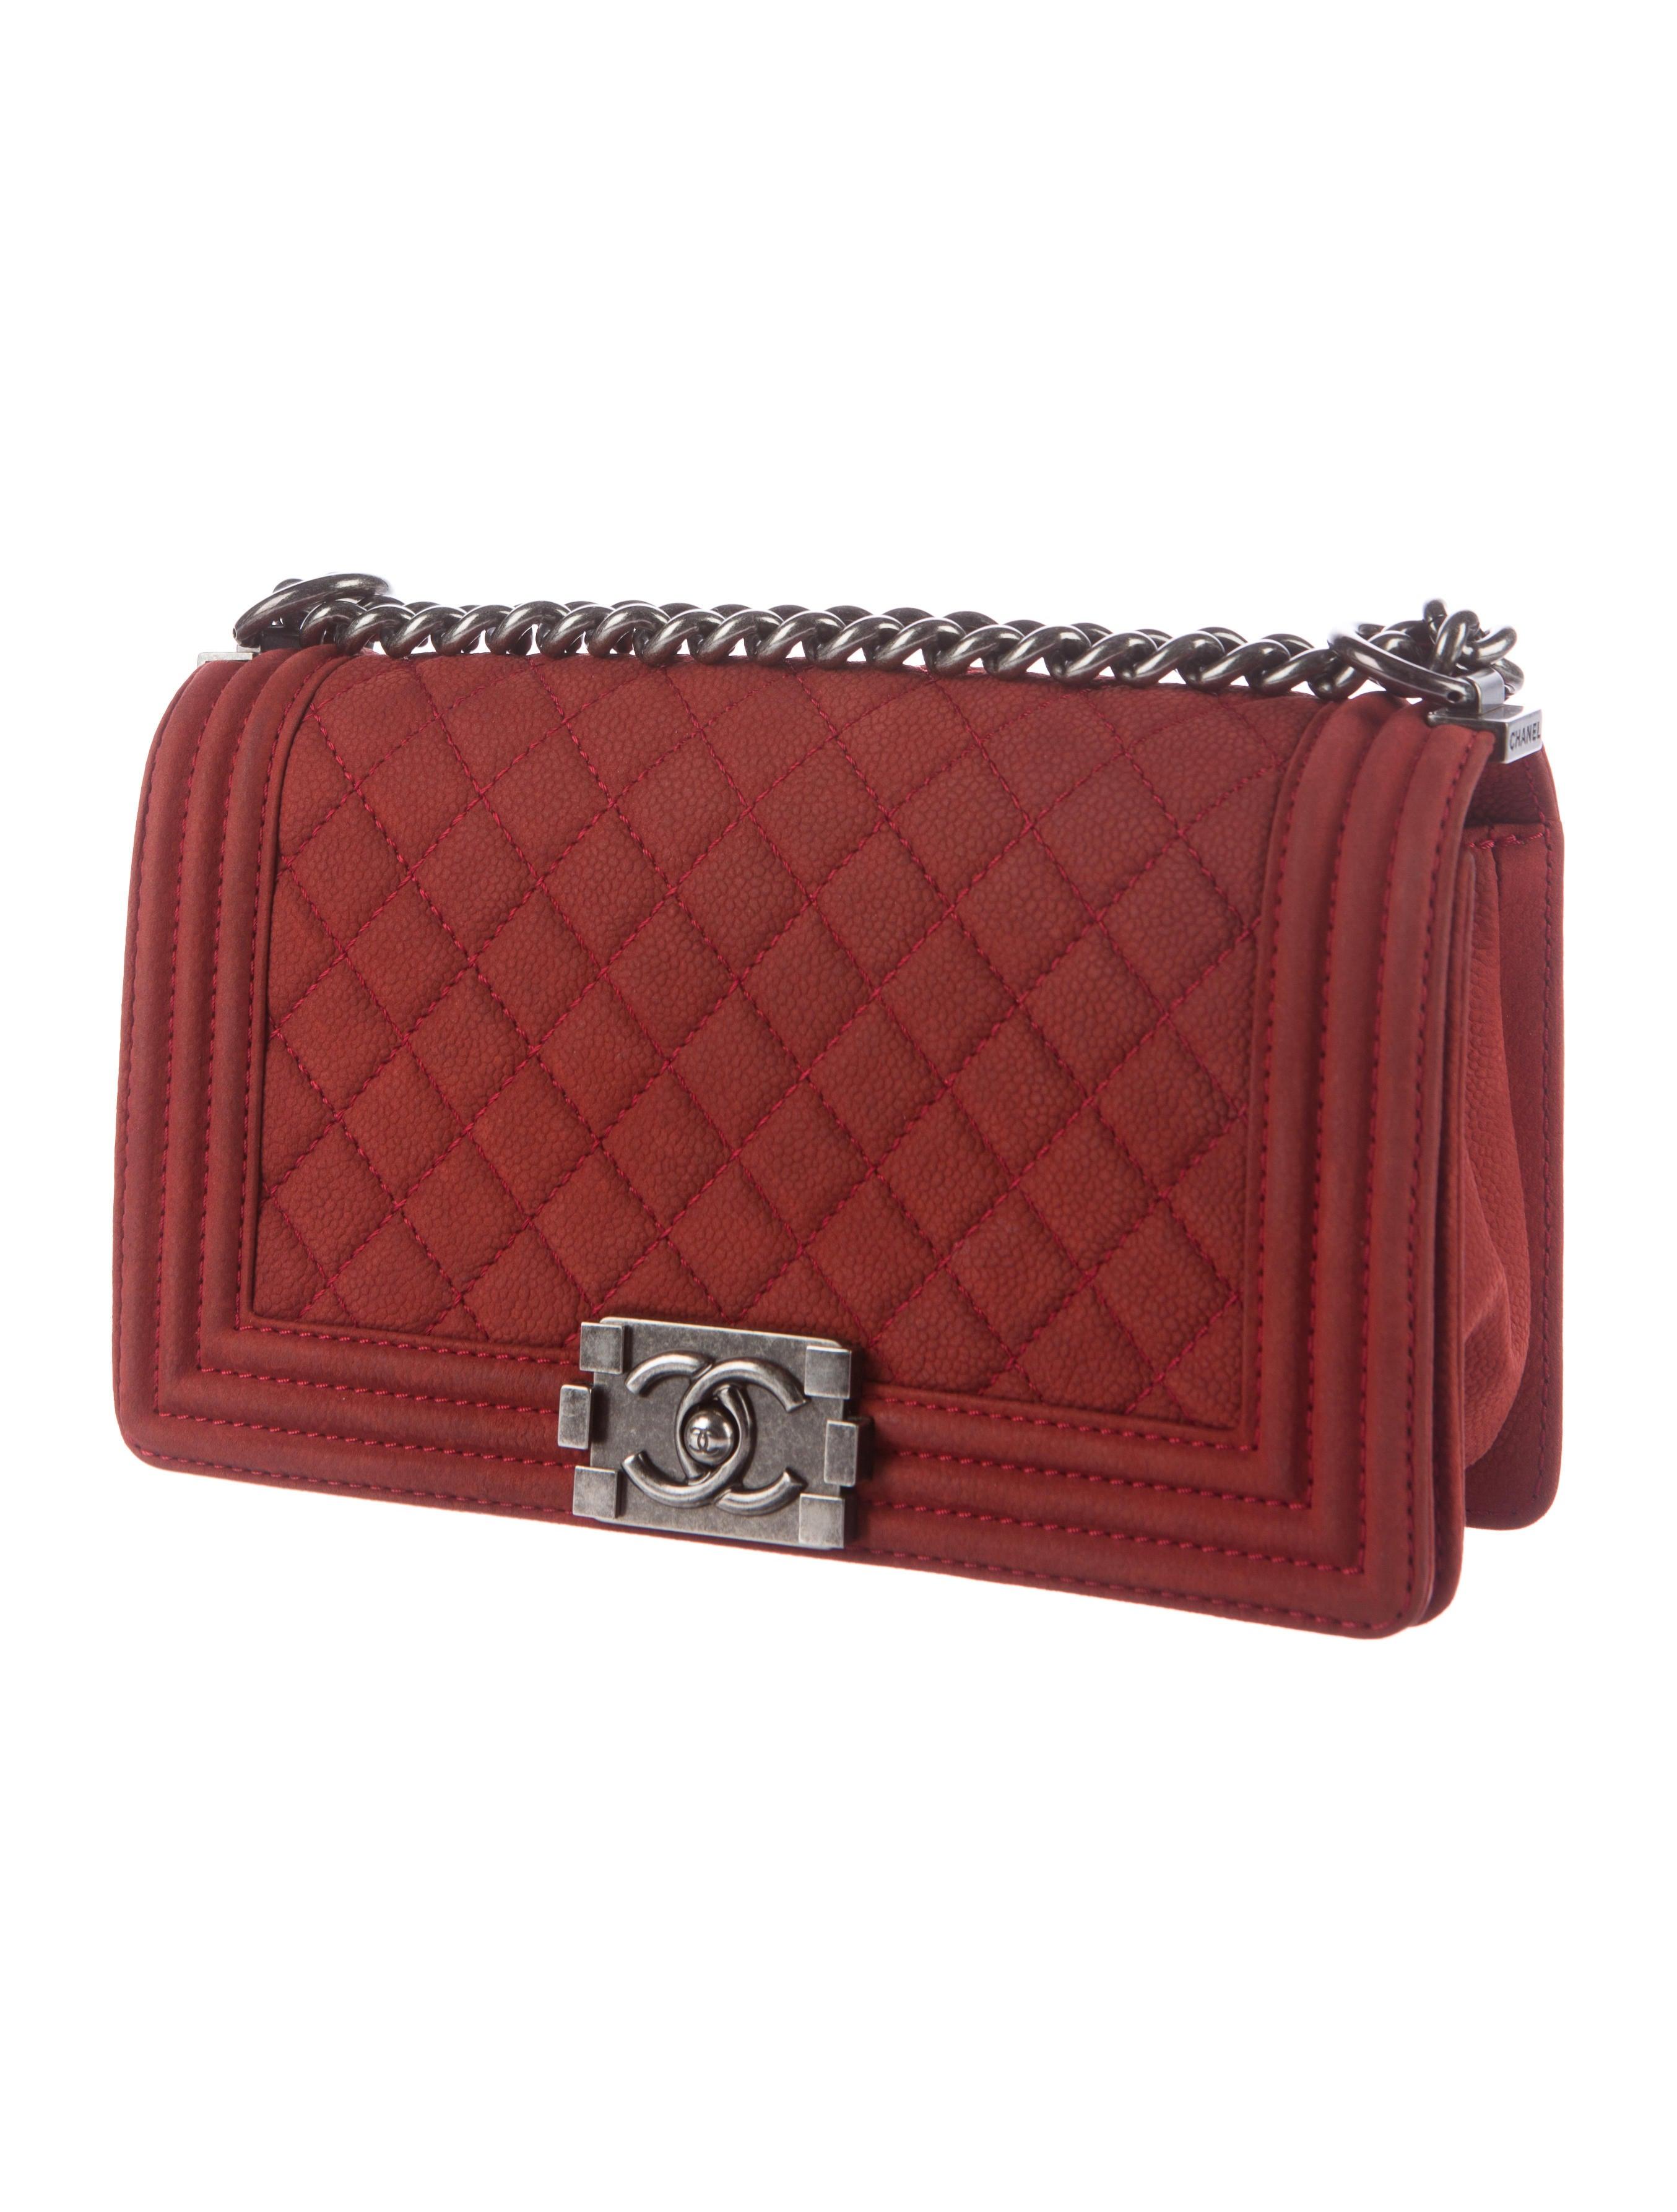 Chanel Quilted Medium Boy Bag - Handbags - CHA184271